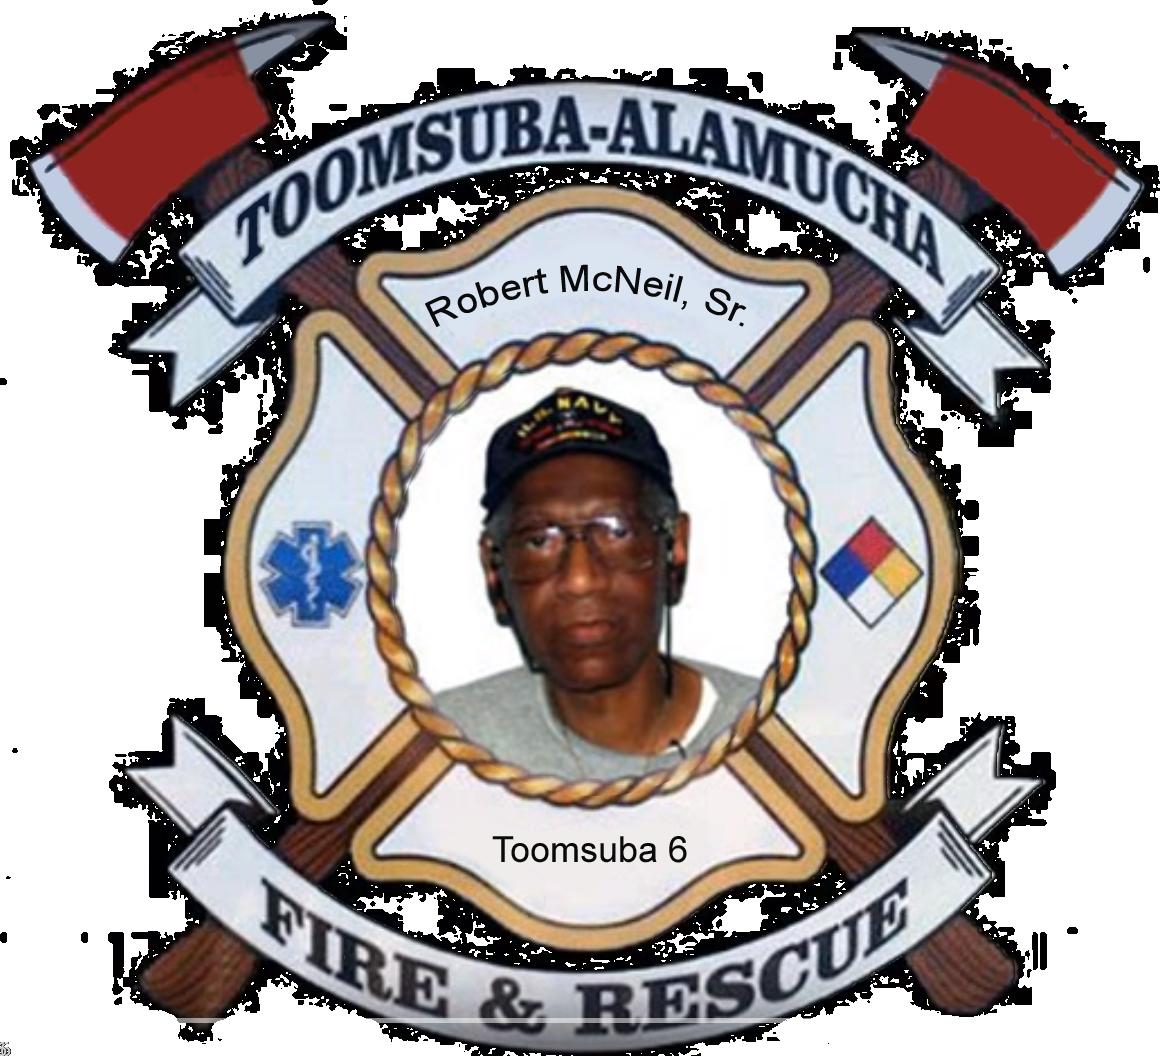 Robert McNeil; Toomsuba Firefighter